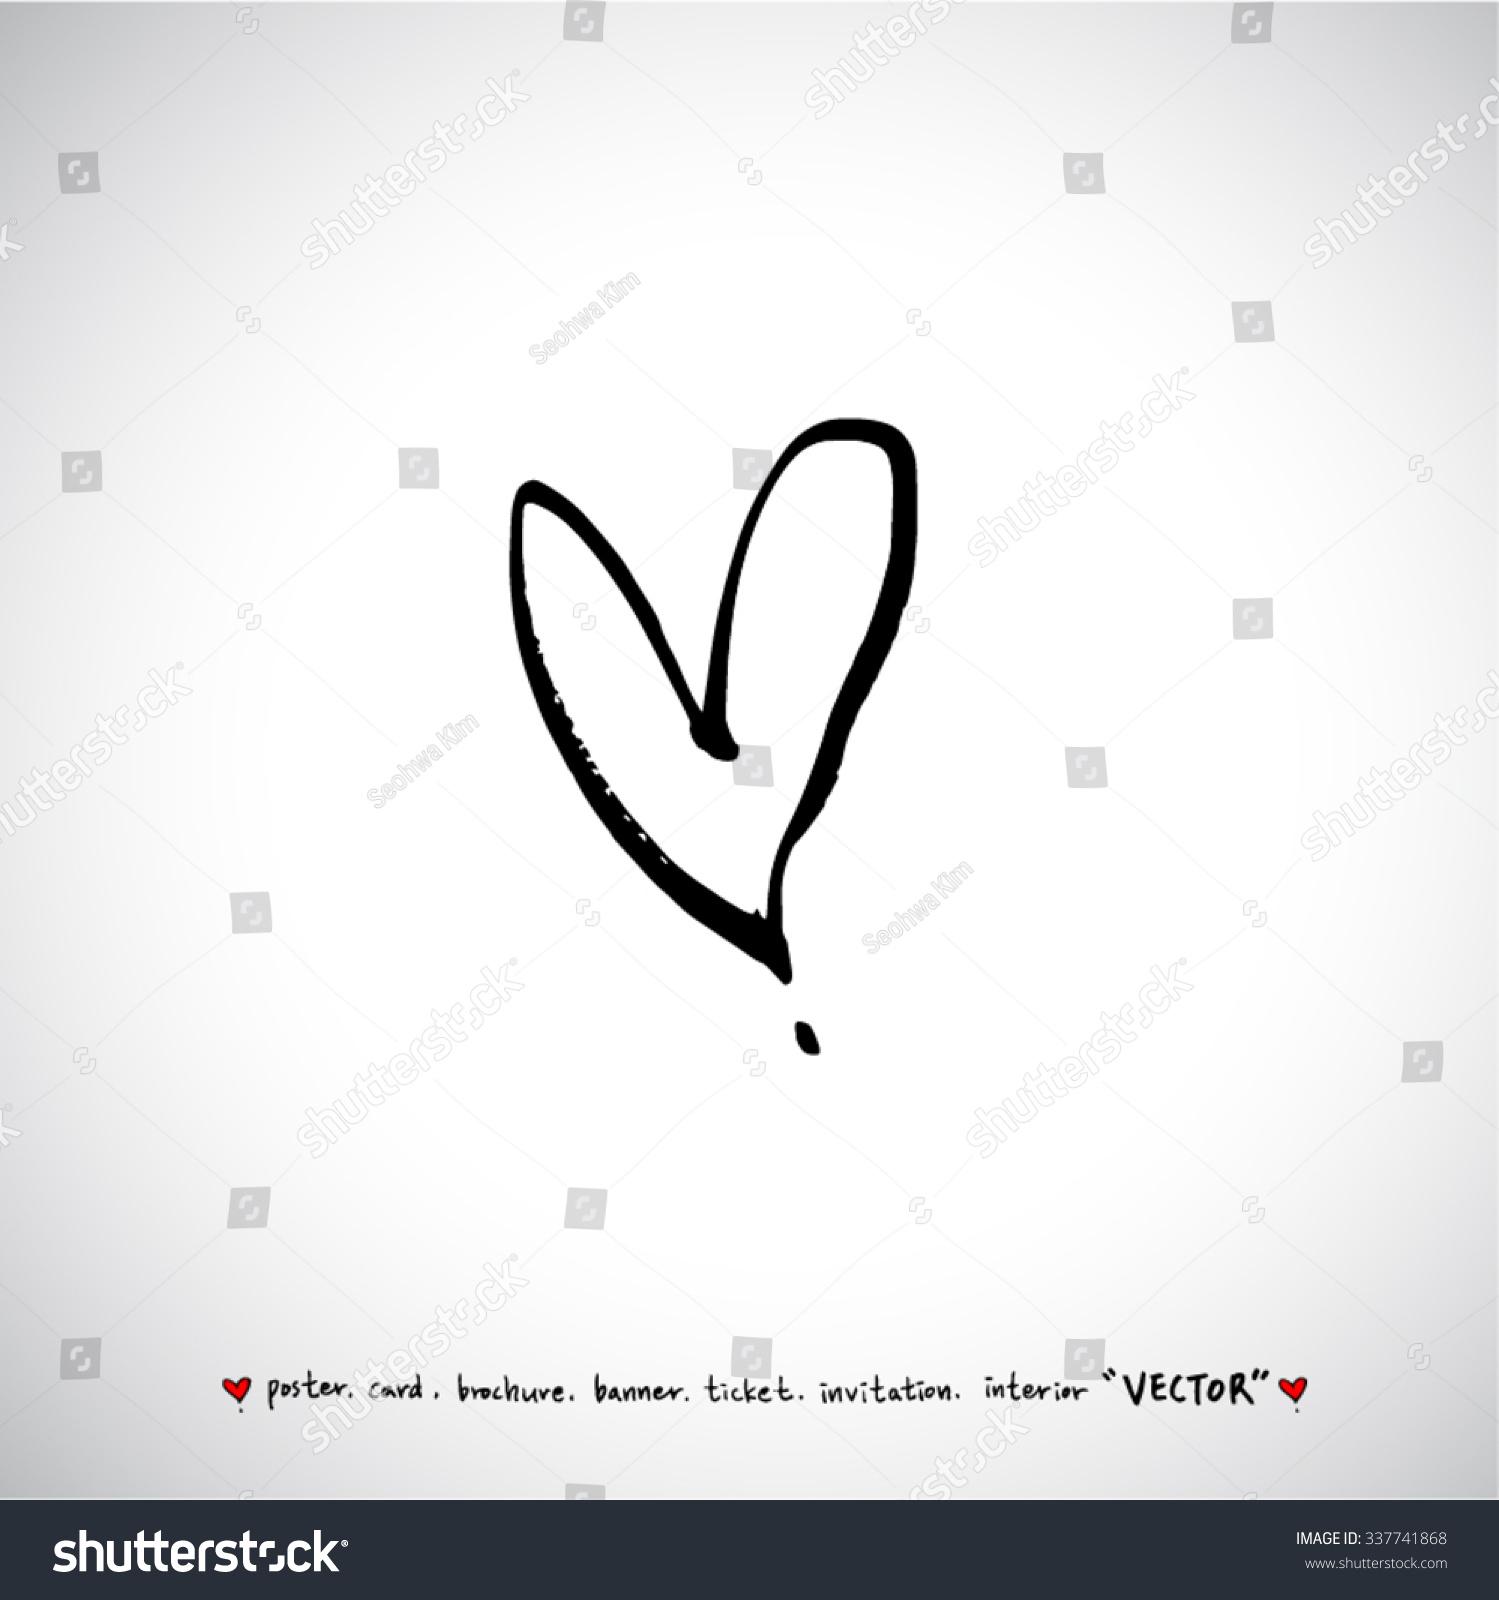 Hand Drawn Heart Vector Calligraphy Stock Vector 337741868